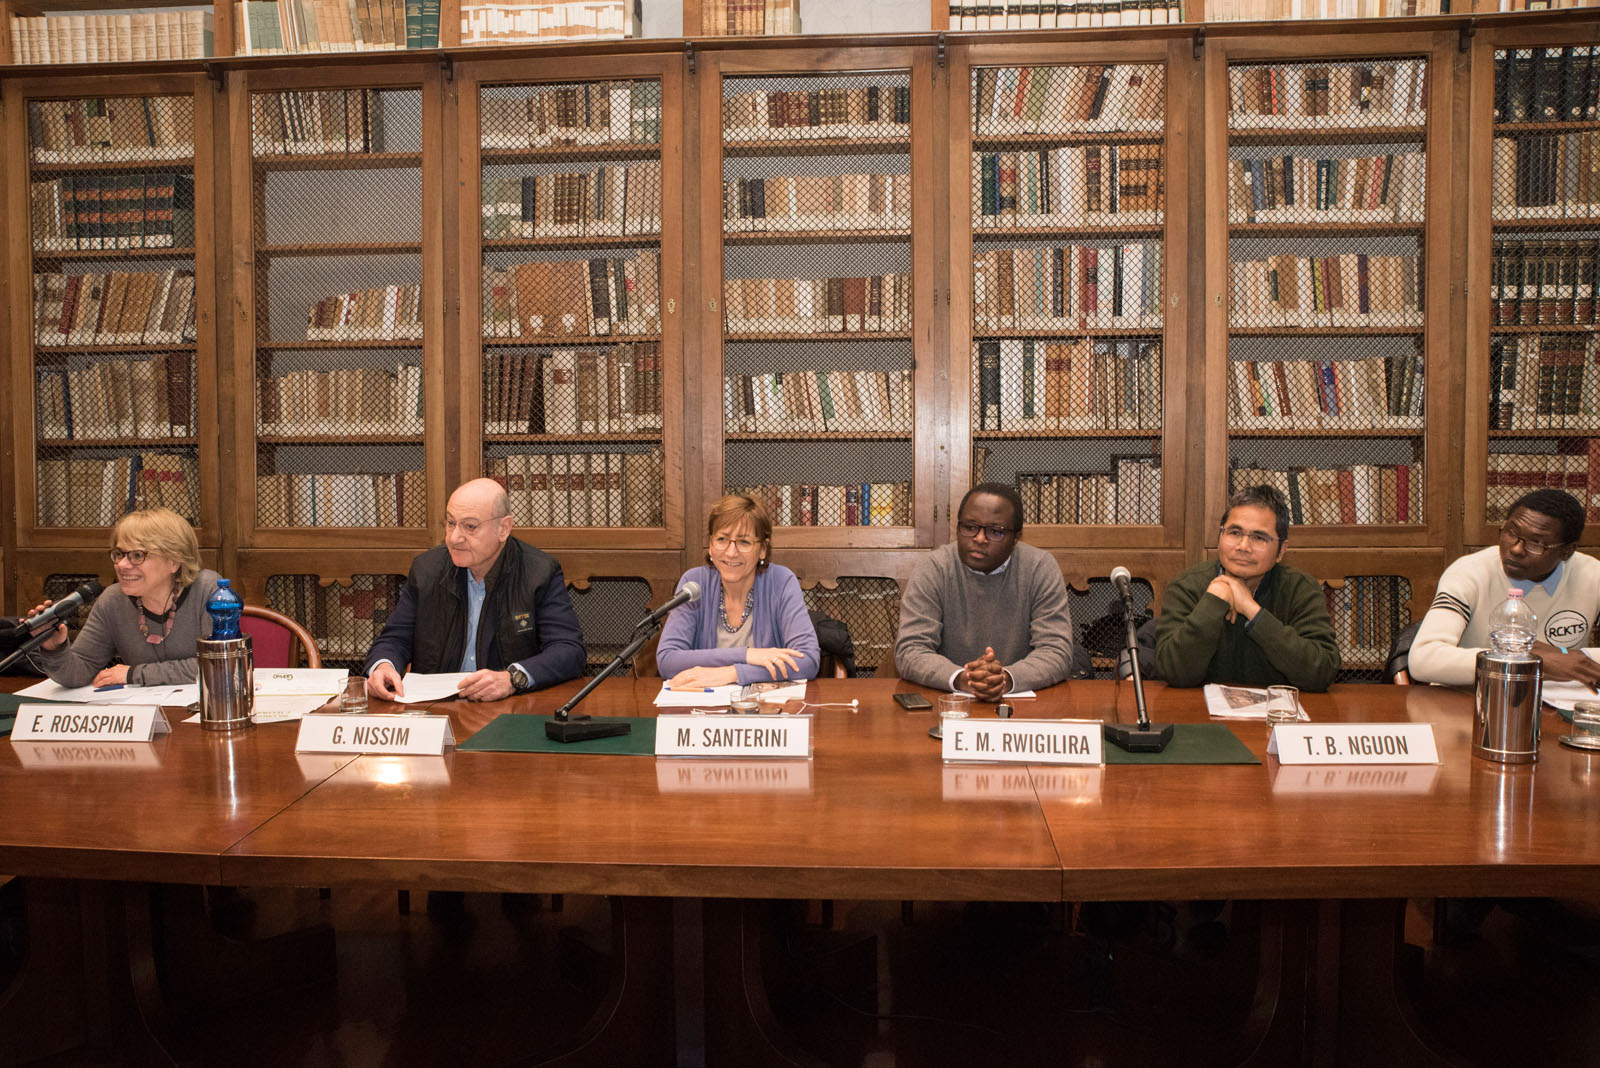 with Elisabetta Rosaspina, Milena Santerini, Gabriele Nissim, Eugène Muhire Rwigilira, Tho Bovannrith Nguon, Abbas Ismail Mohamed